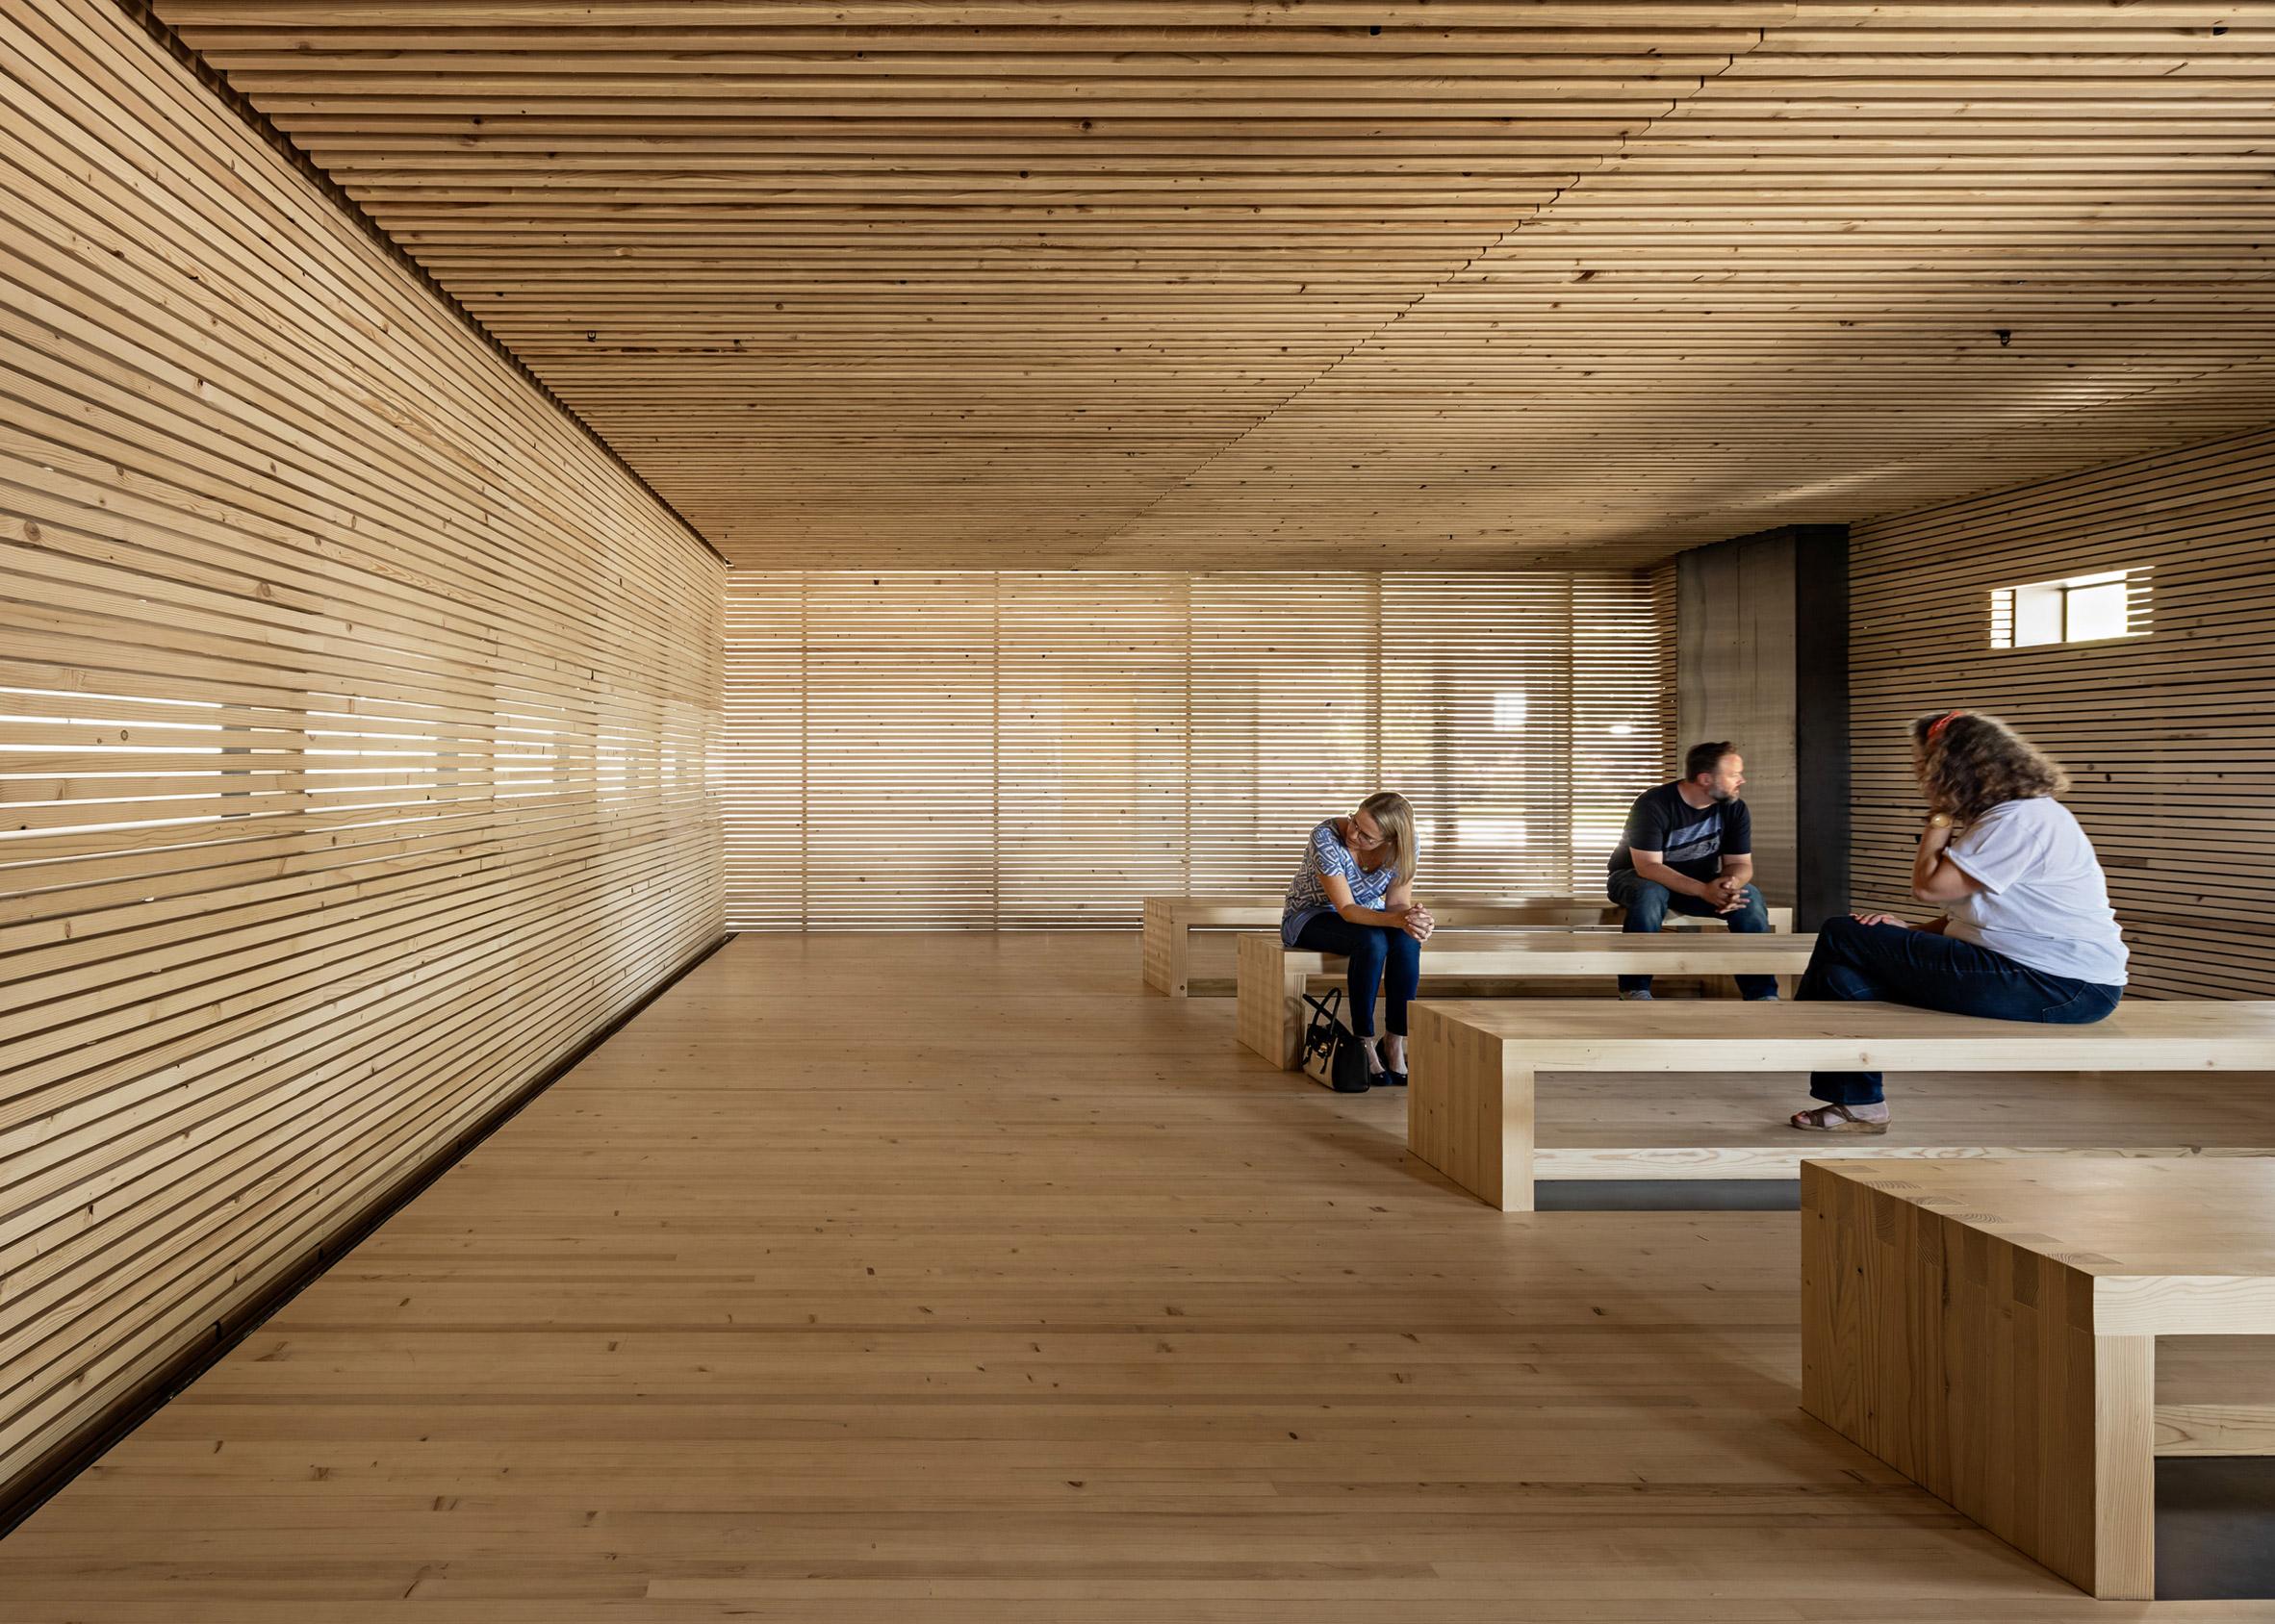 Prayer Space Redemption Gilbert, Gilbert, Arizona by Debartolo Architects